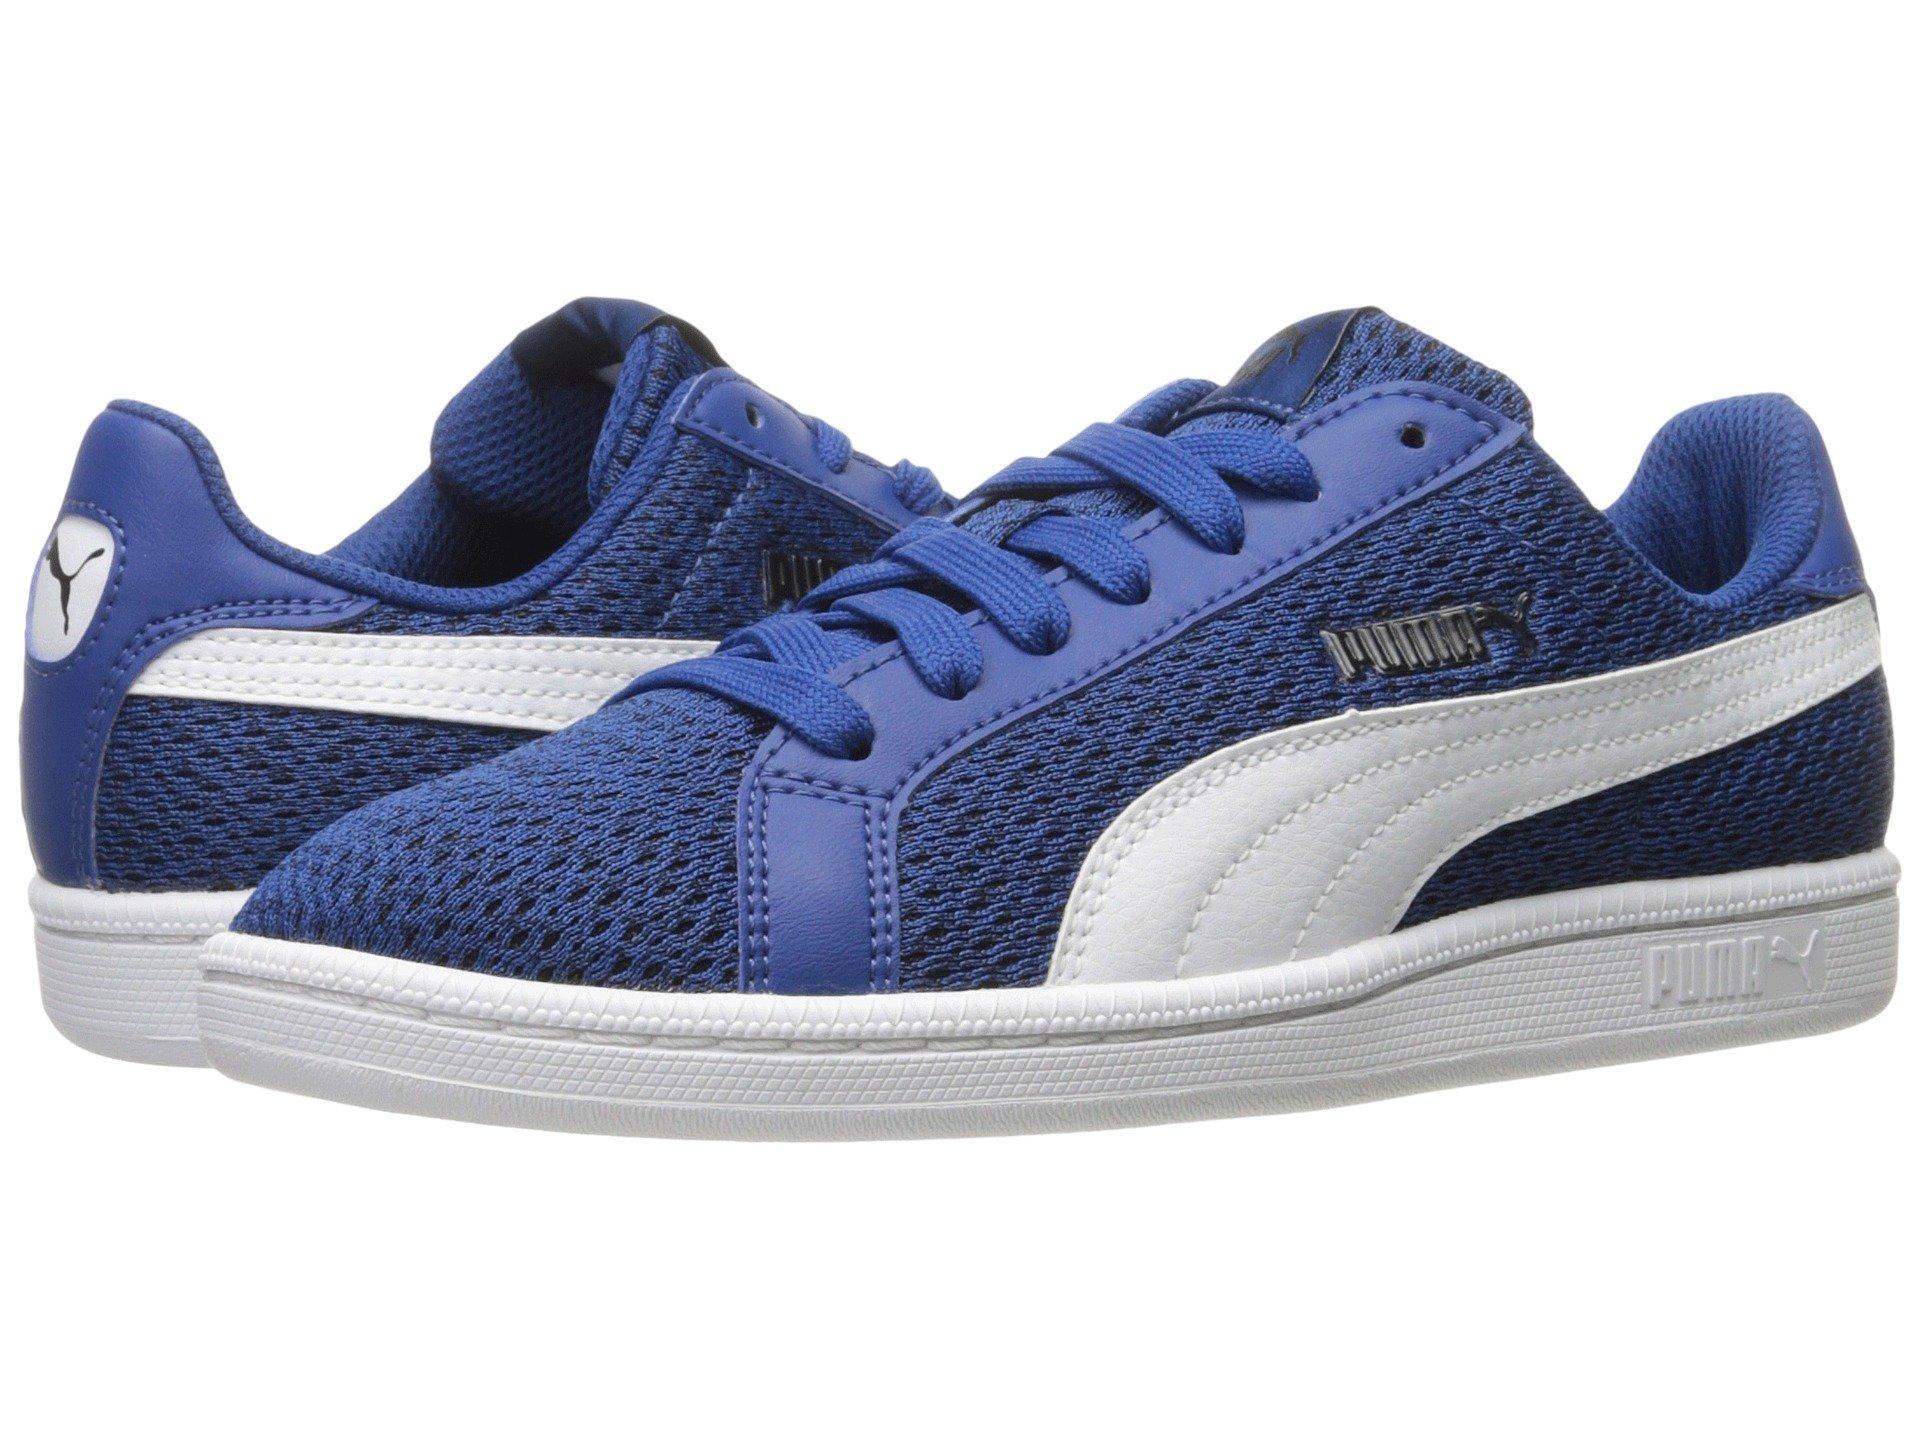 Puma Smash Knit In True Blue/ White